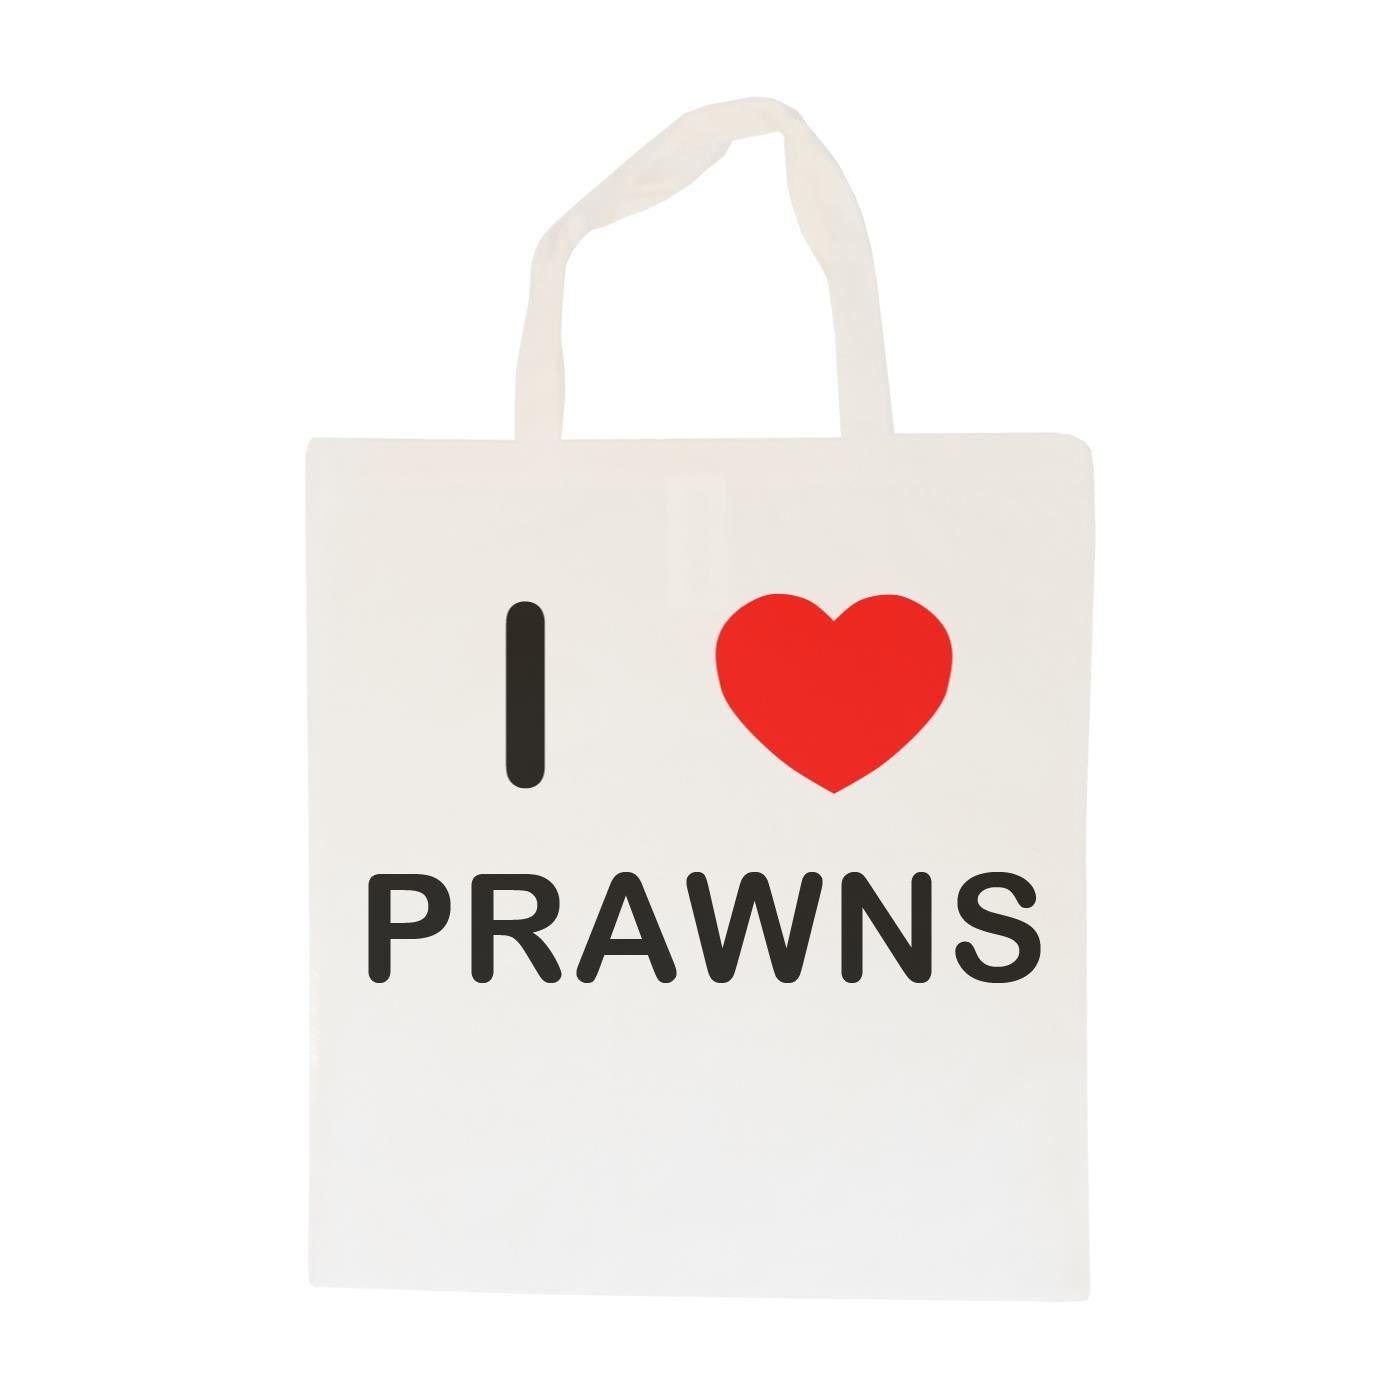 I Love Prawns - Cotton Bag | Size choice Tote, Shopper or Sling